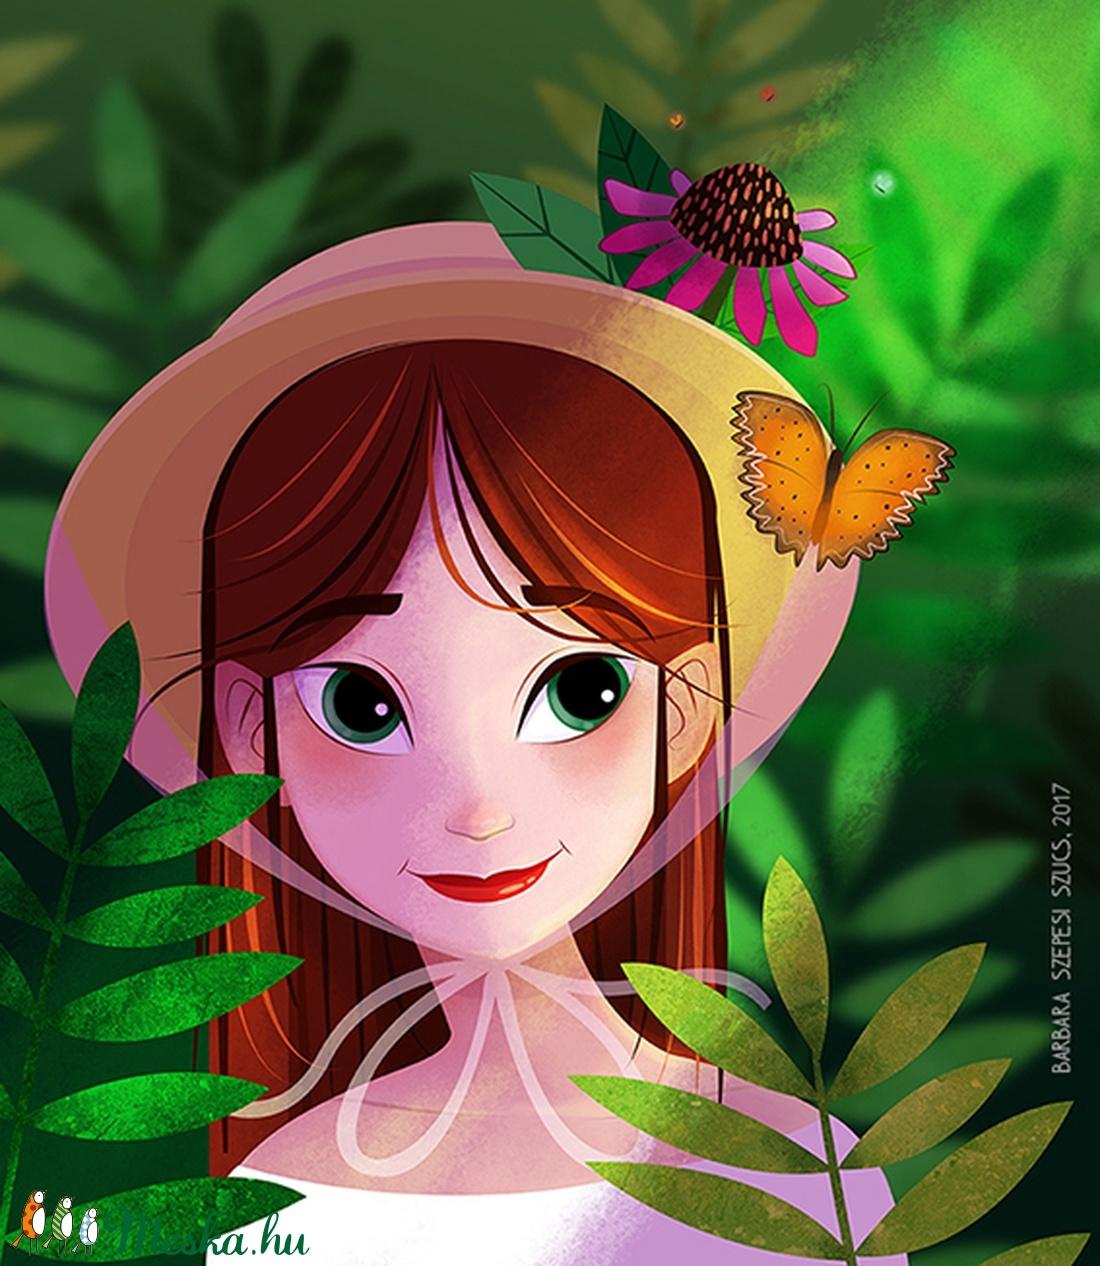 Lány kalapban - Print (Digitális) (bubadesign) - Meska.hu